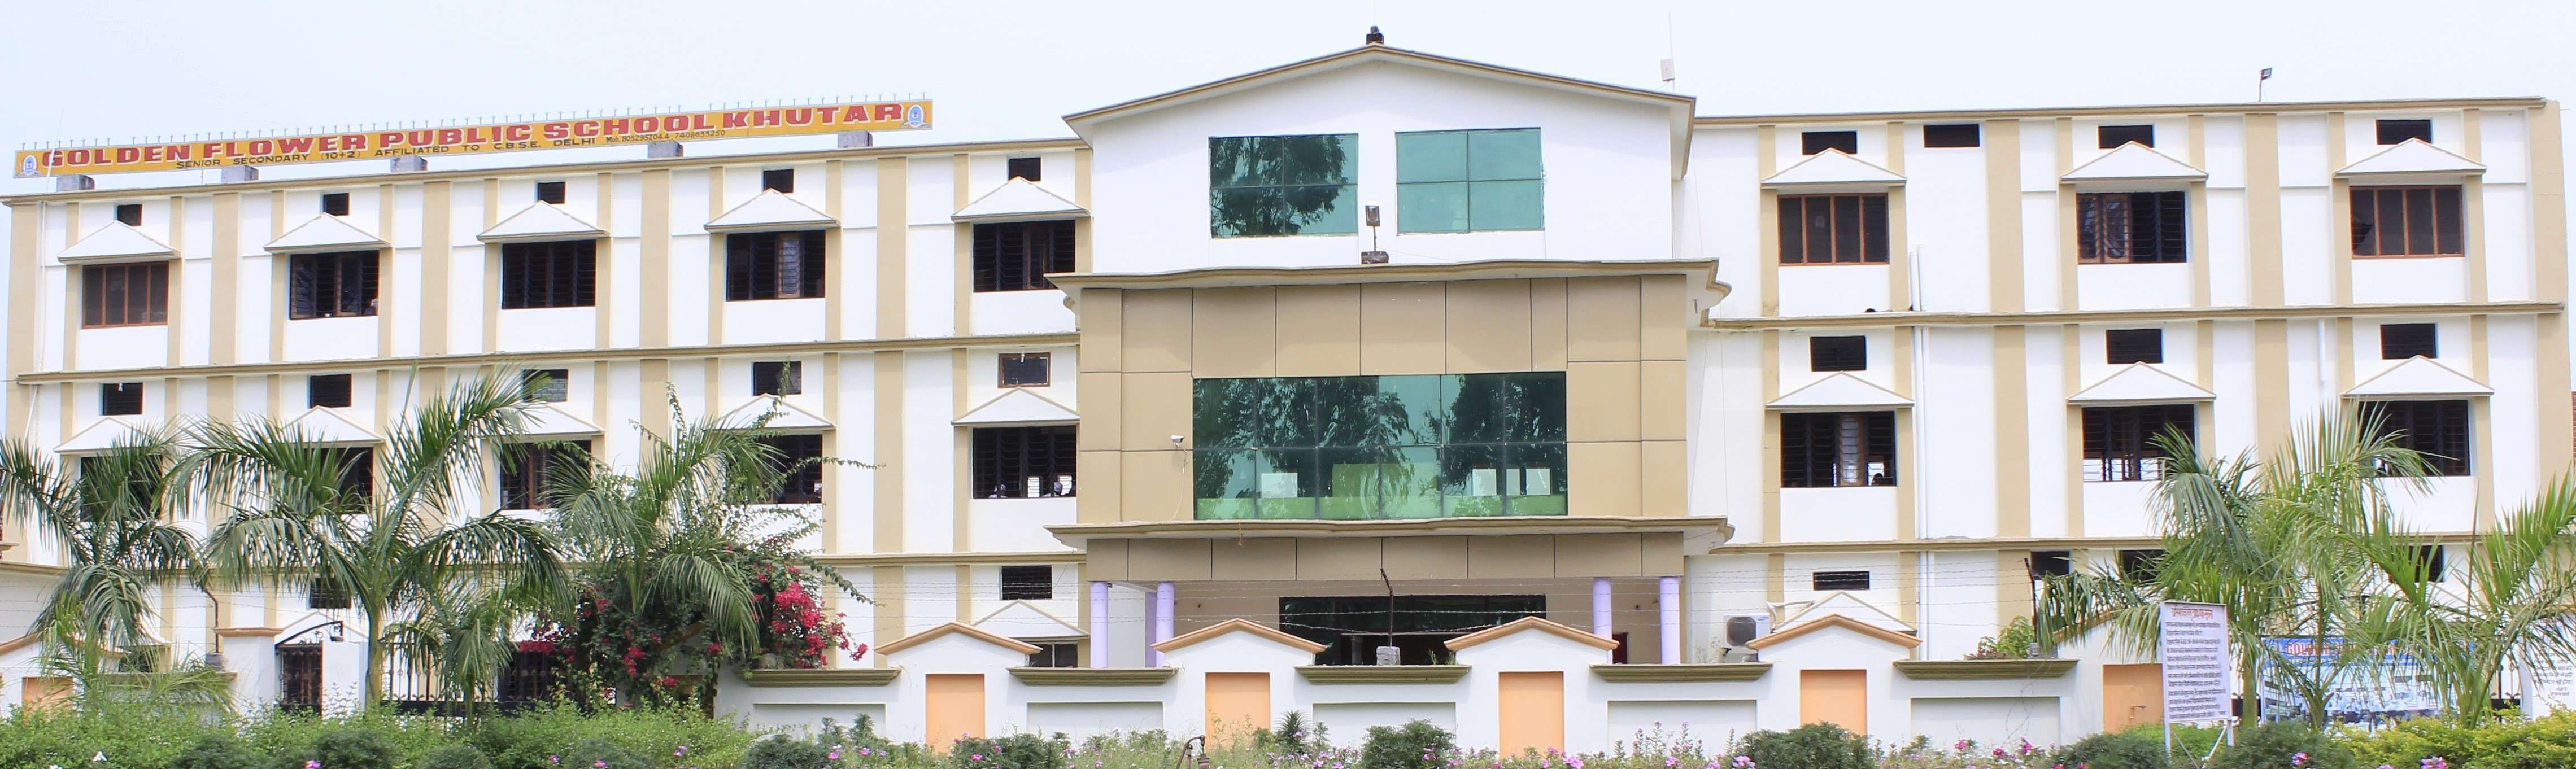 Golden Flower Public School Tikuniya Gola road khutarDistt Sahajanpur 2131369